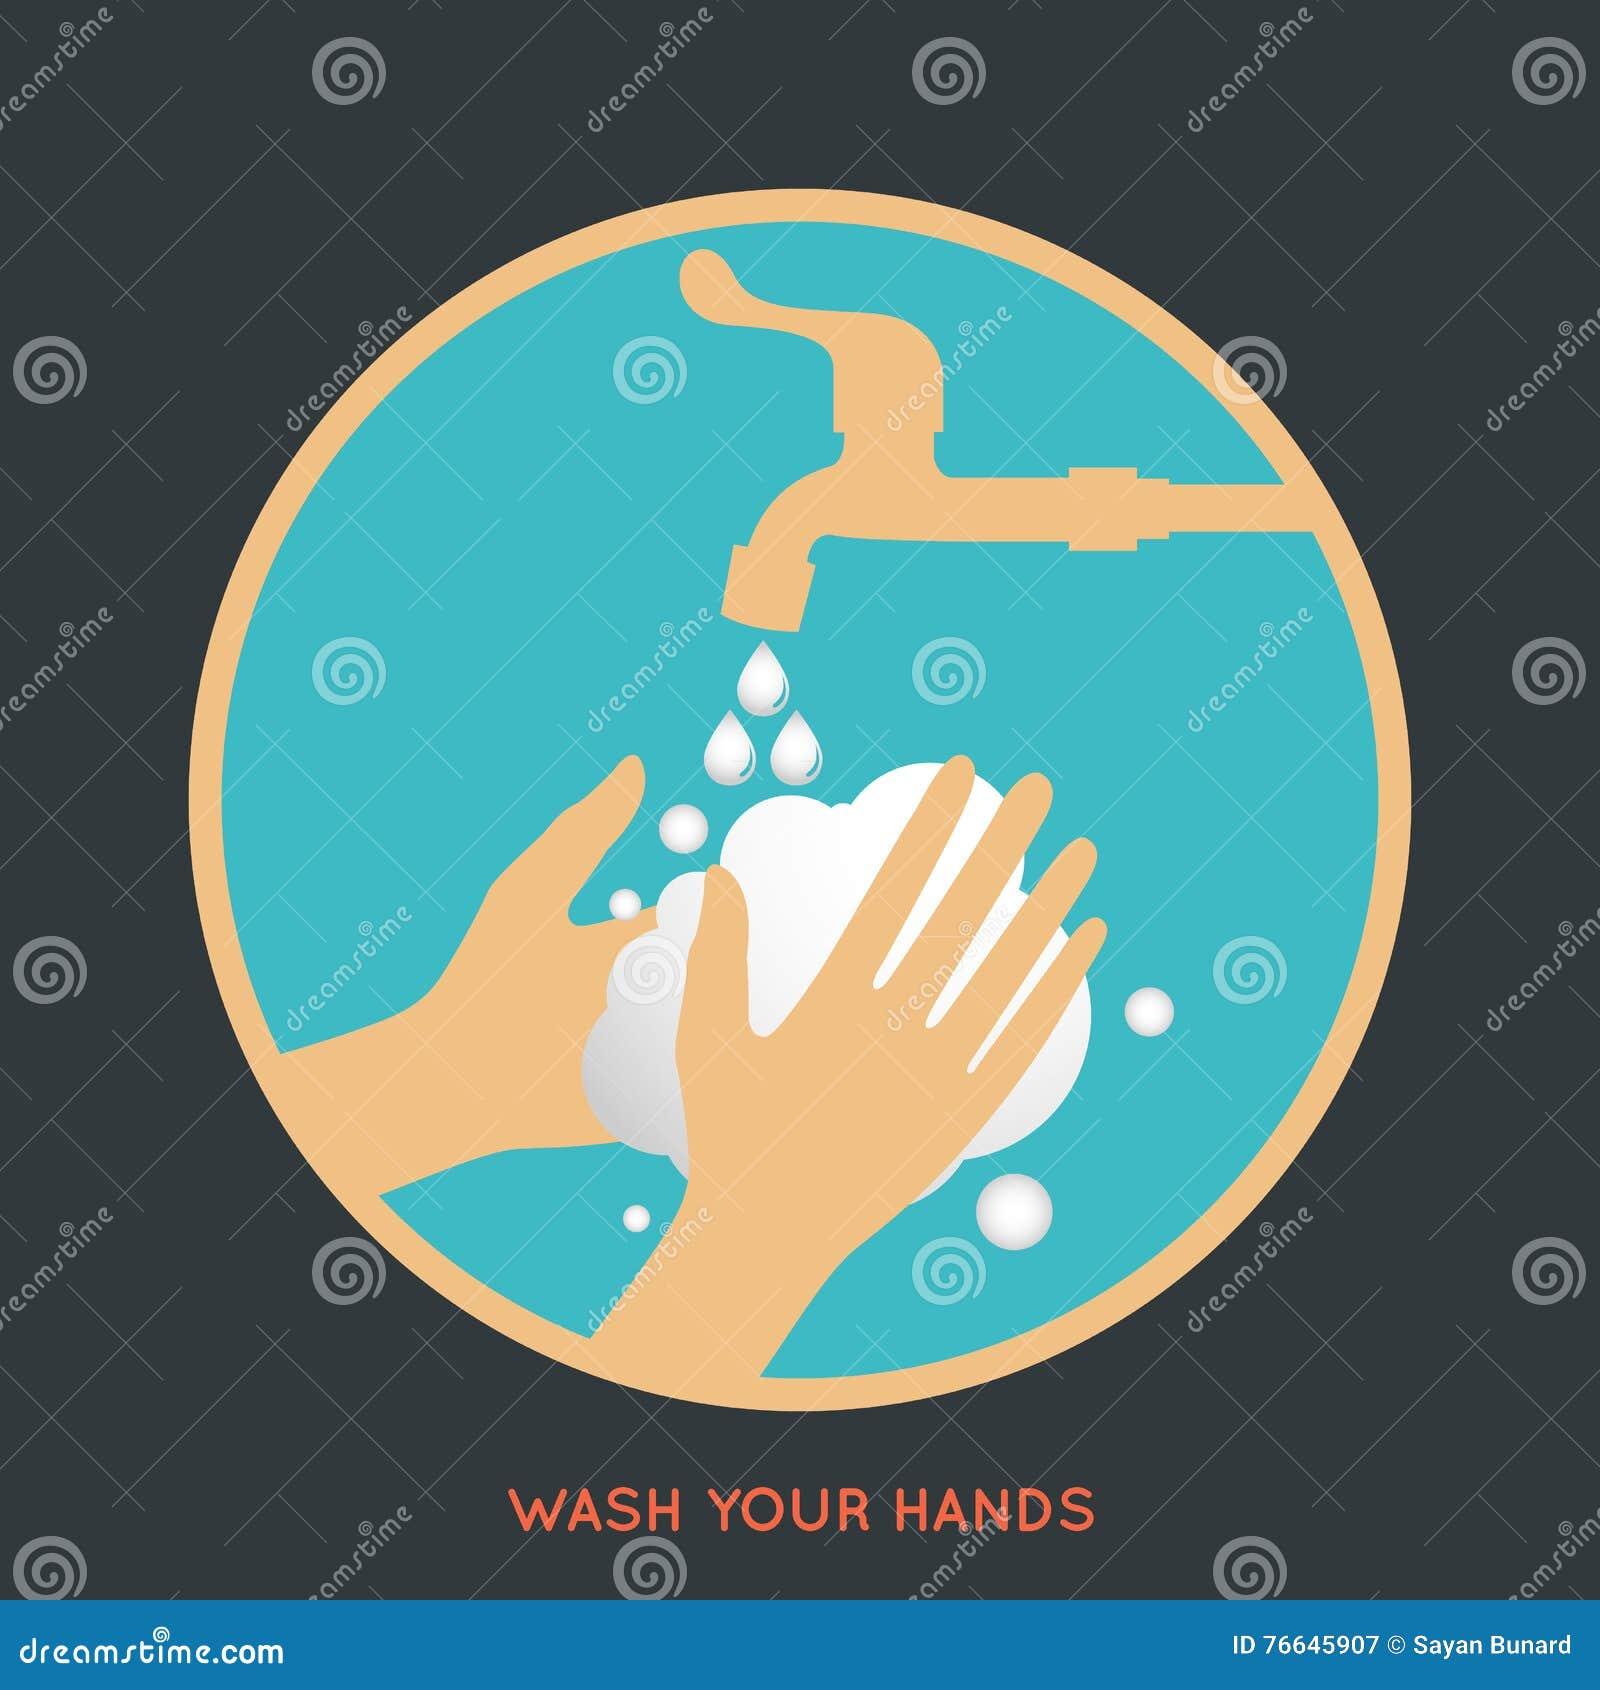 Wash Your Hands Symbol Stock Vector Illustration Of Danger 76645907